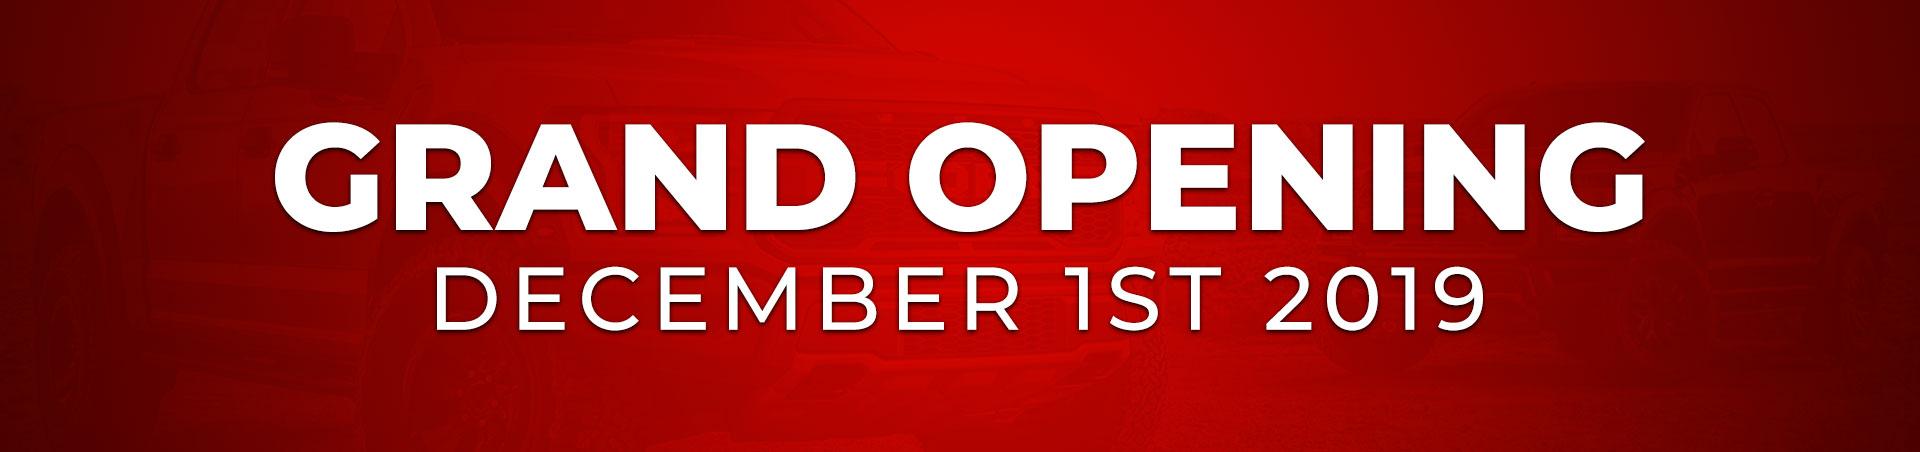 Grand Opening - December 1st 2019